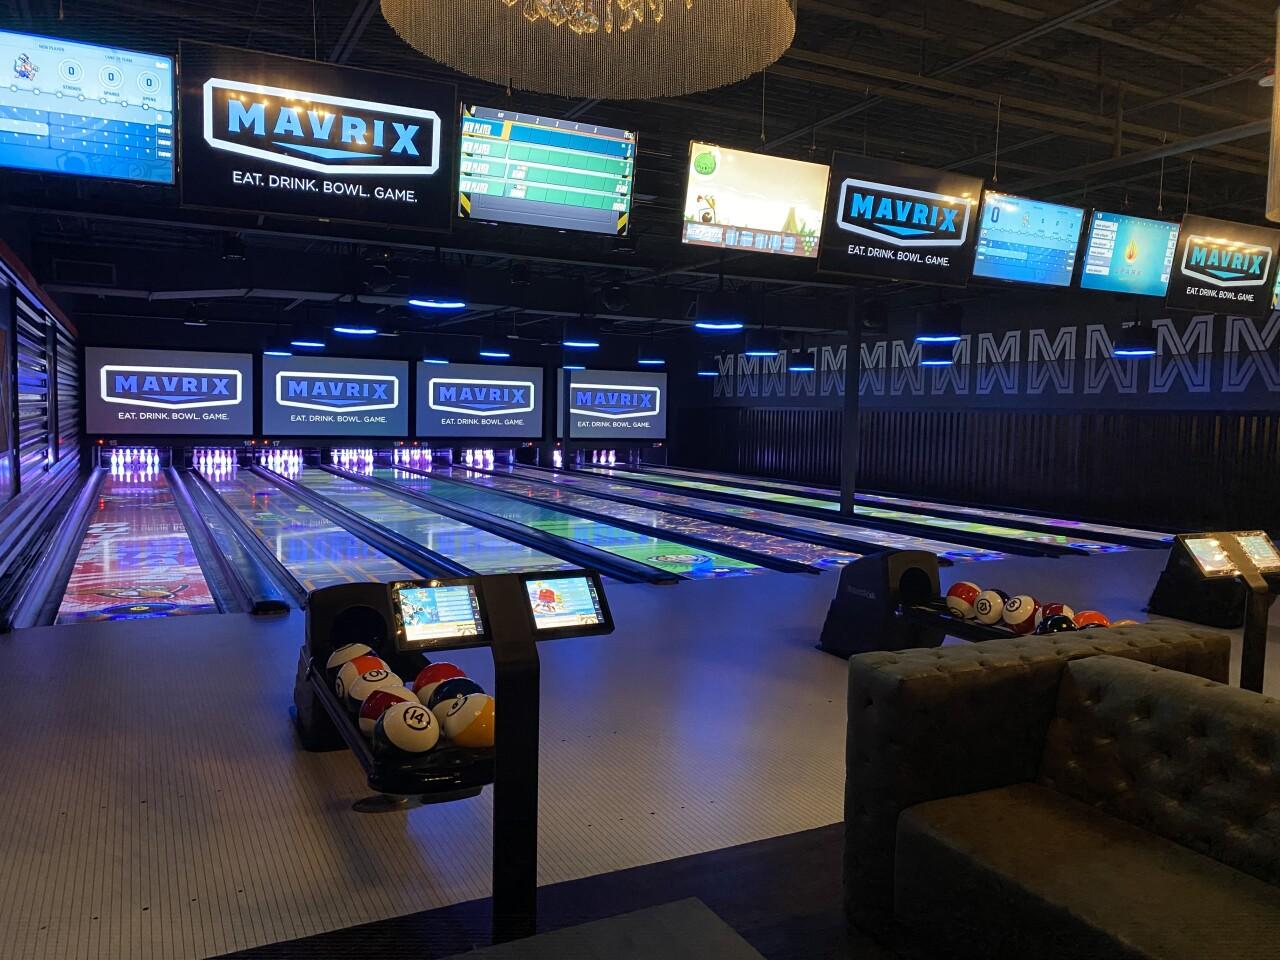 Mavrix Spark Bowling